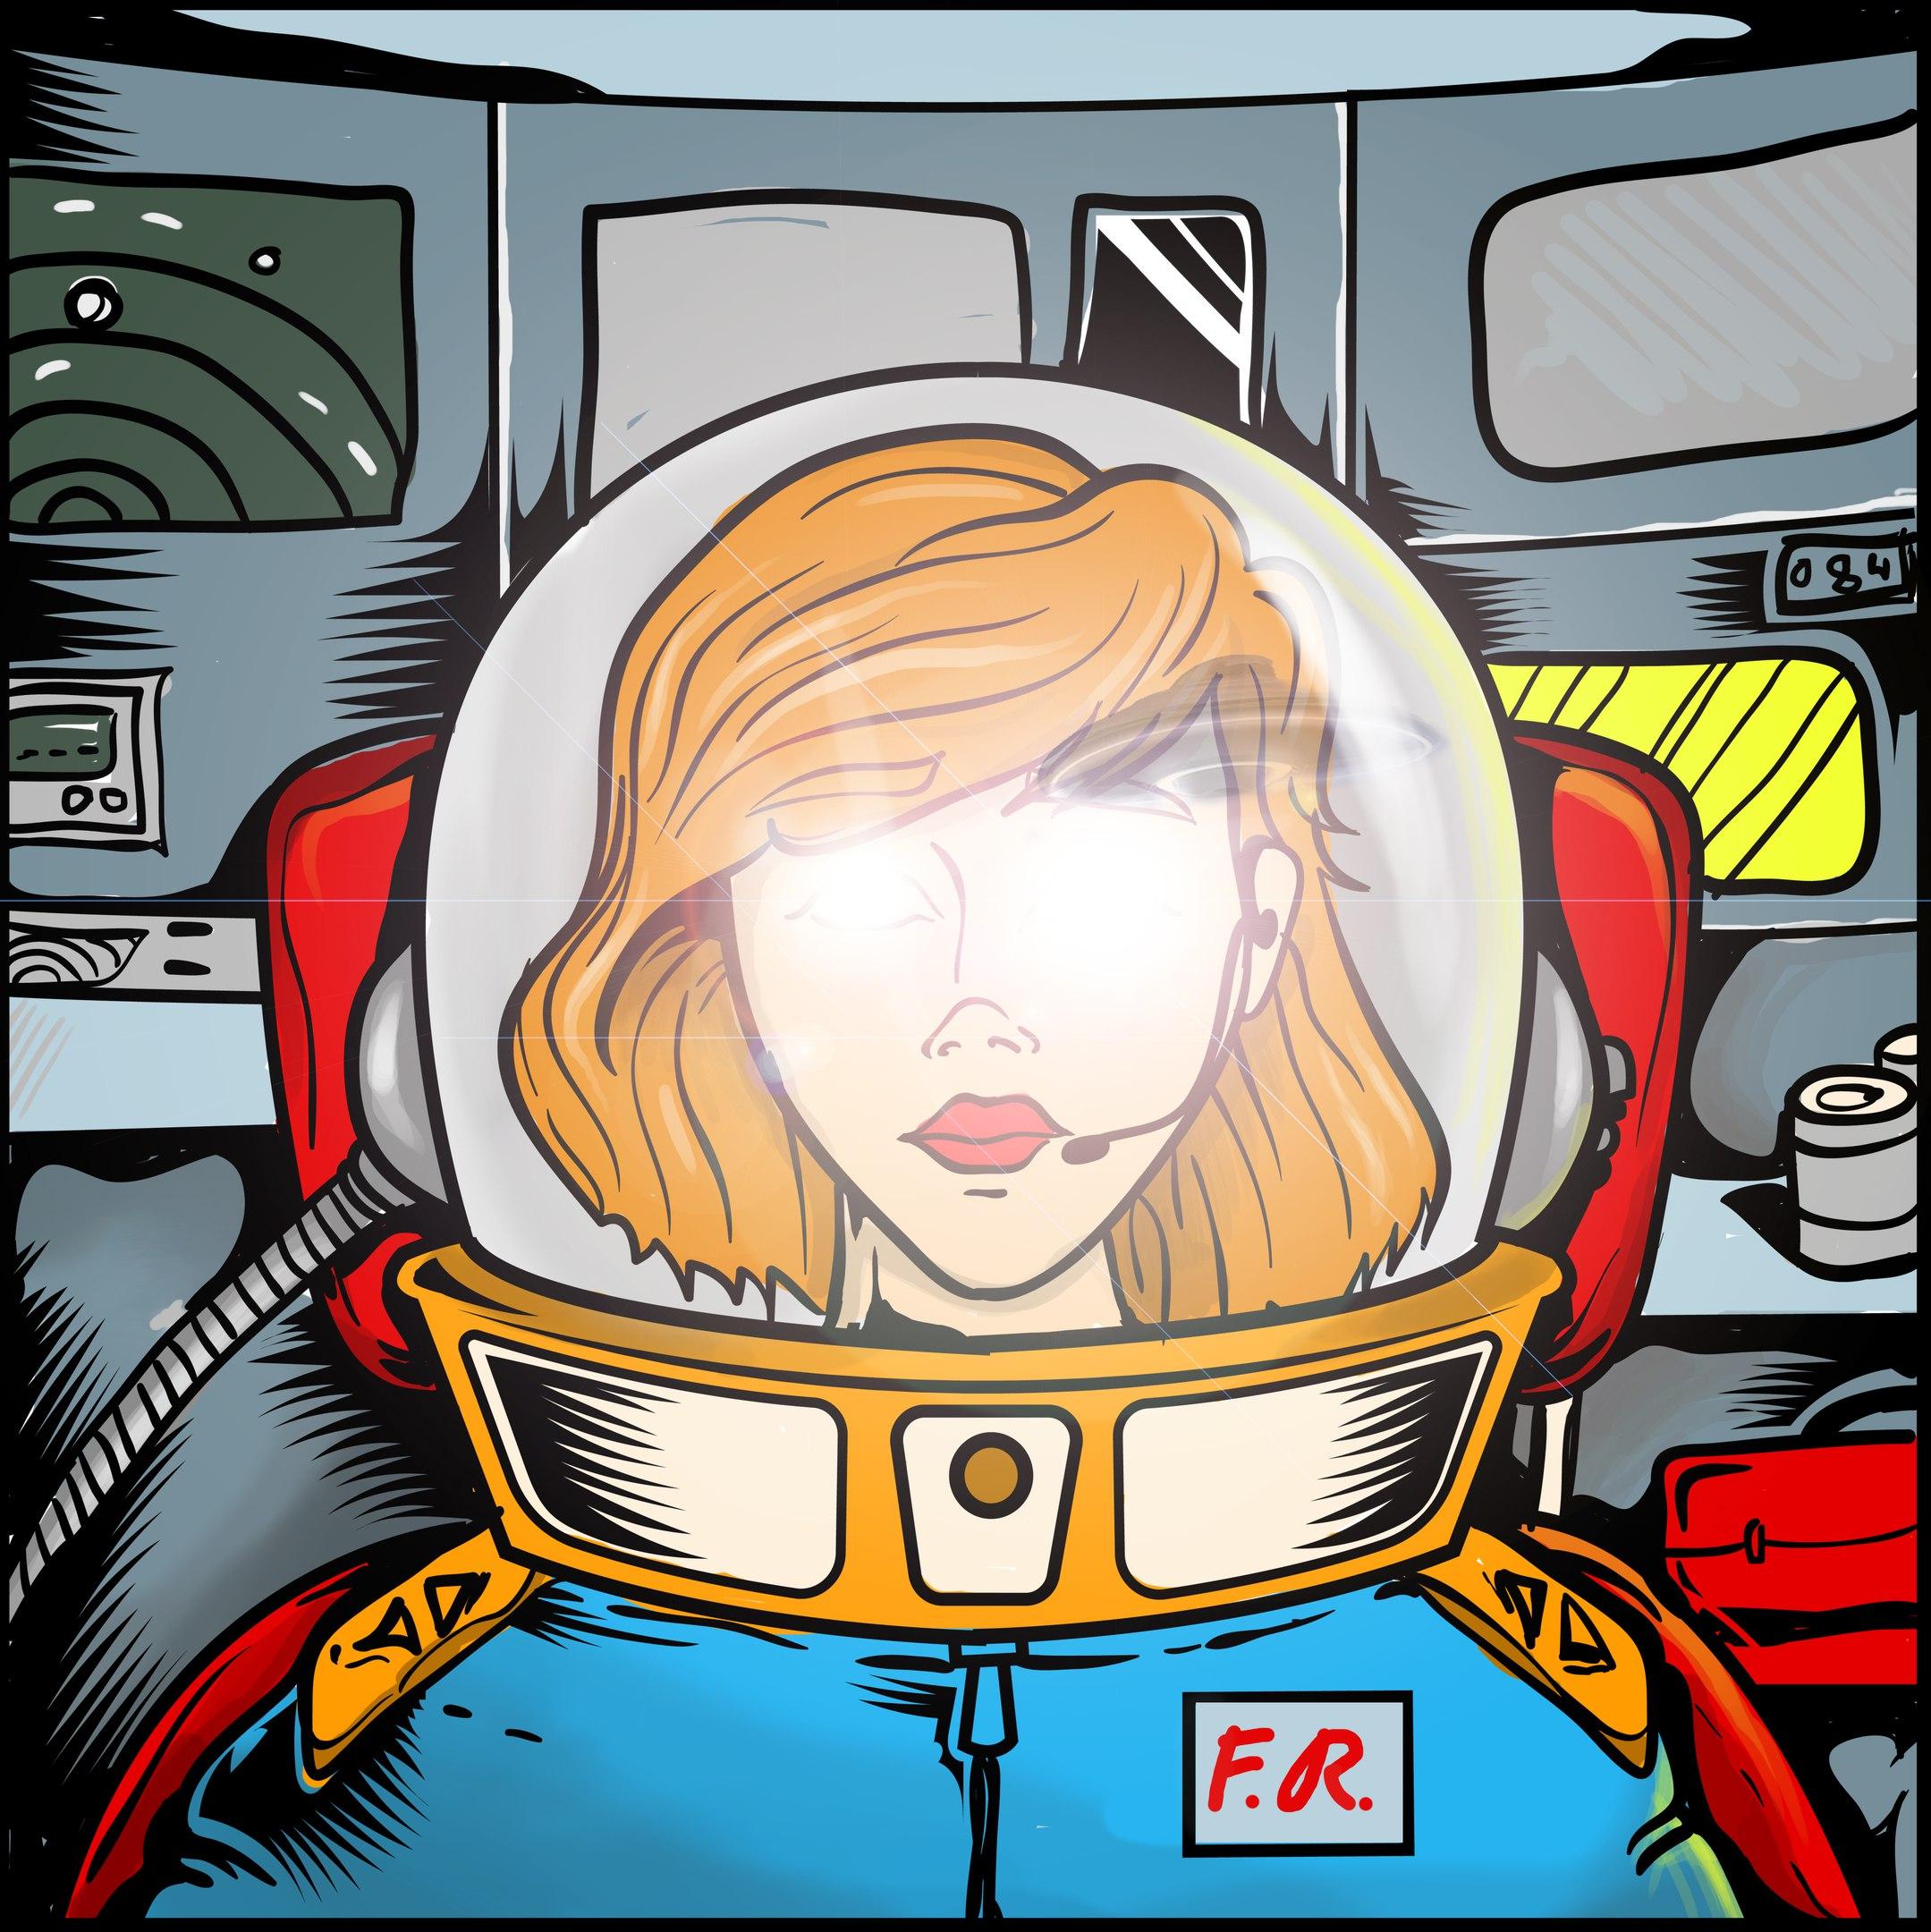 Новый сингл Futuristic Romance - FR